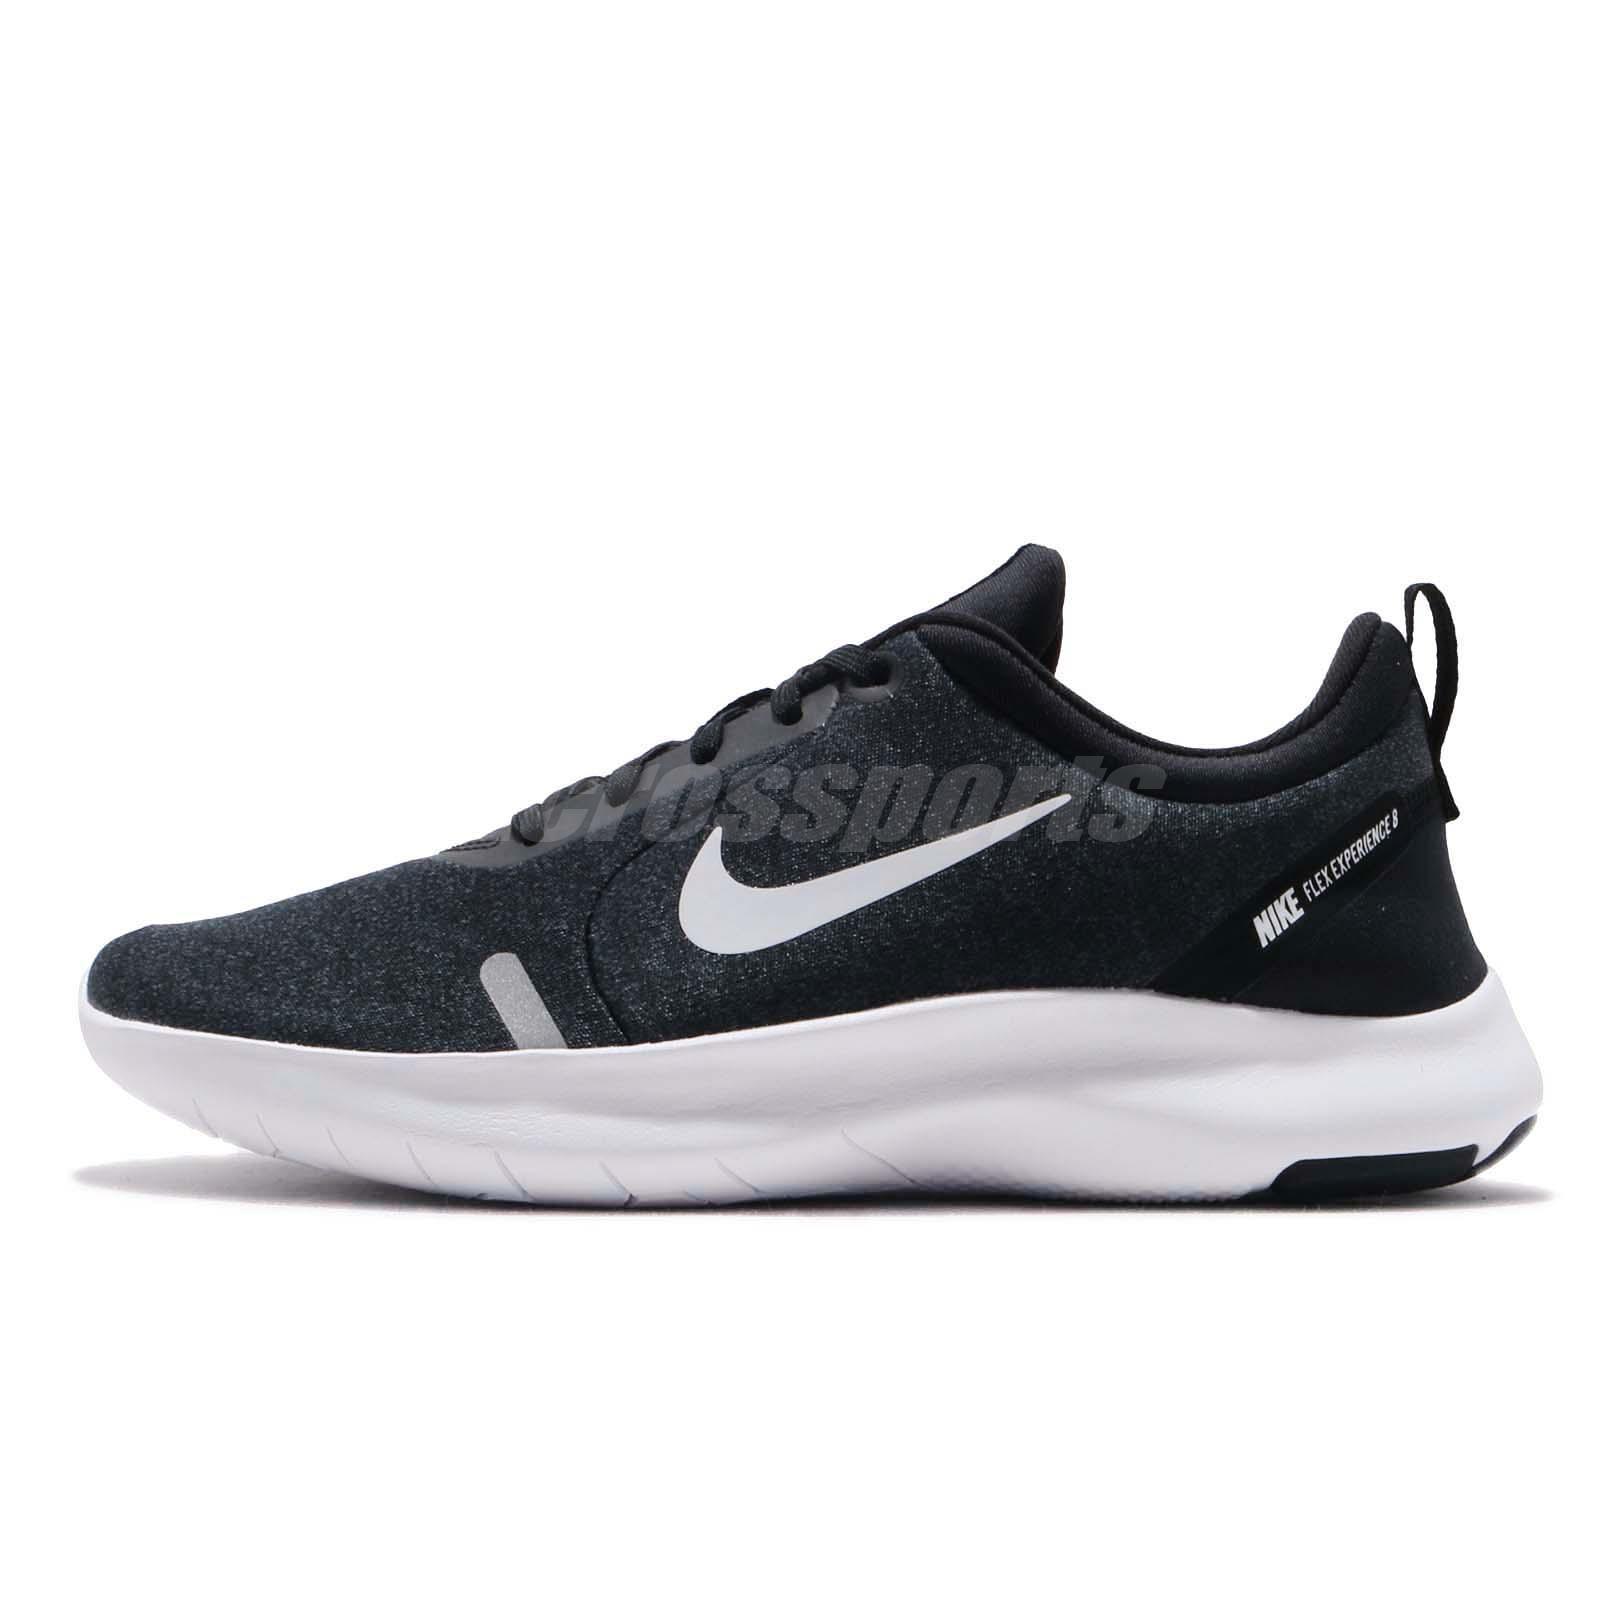 608113330b0 Nike Wmns Flex Experience RN 8 Run Black White Women Running Shoes AJ5908 -013